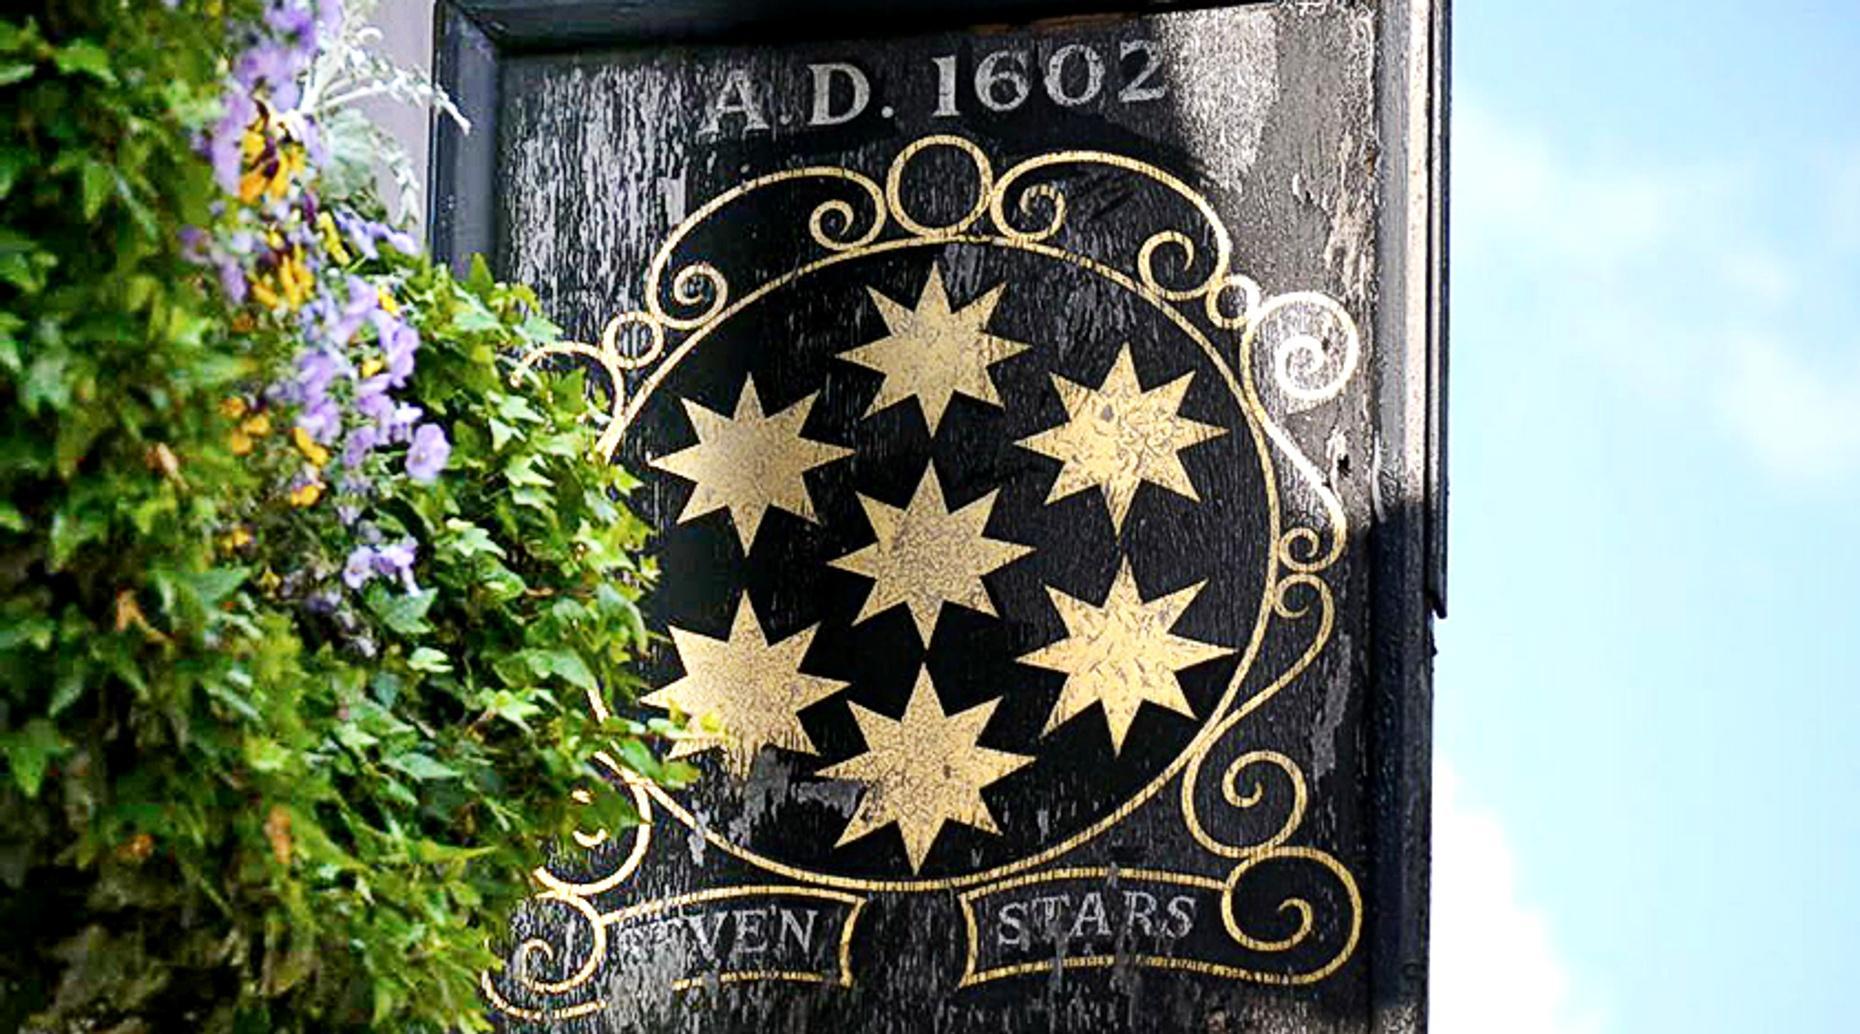 Covent Garden Tavern Tour